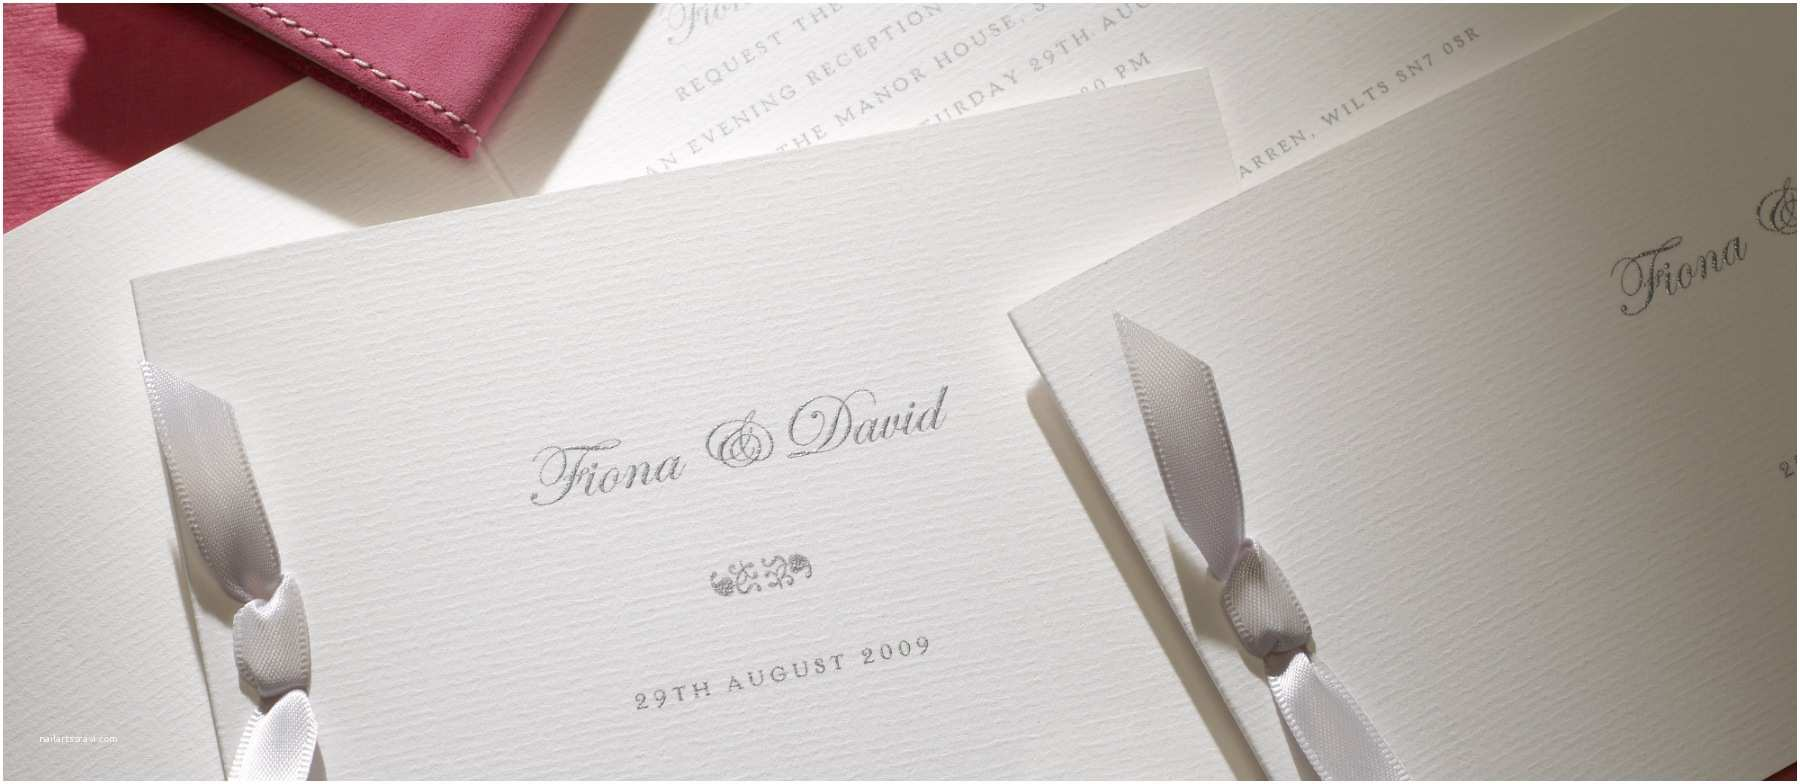 Wedding Invitations Nyc New York Personalised Wedding Invitations